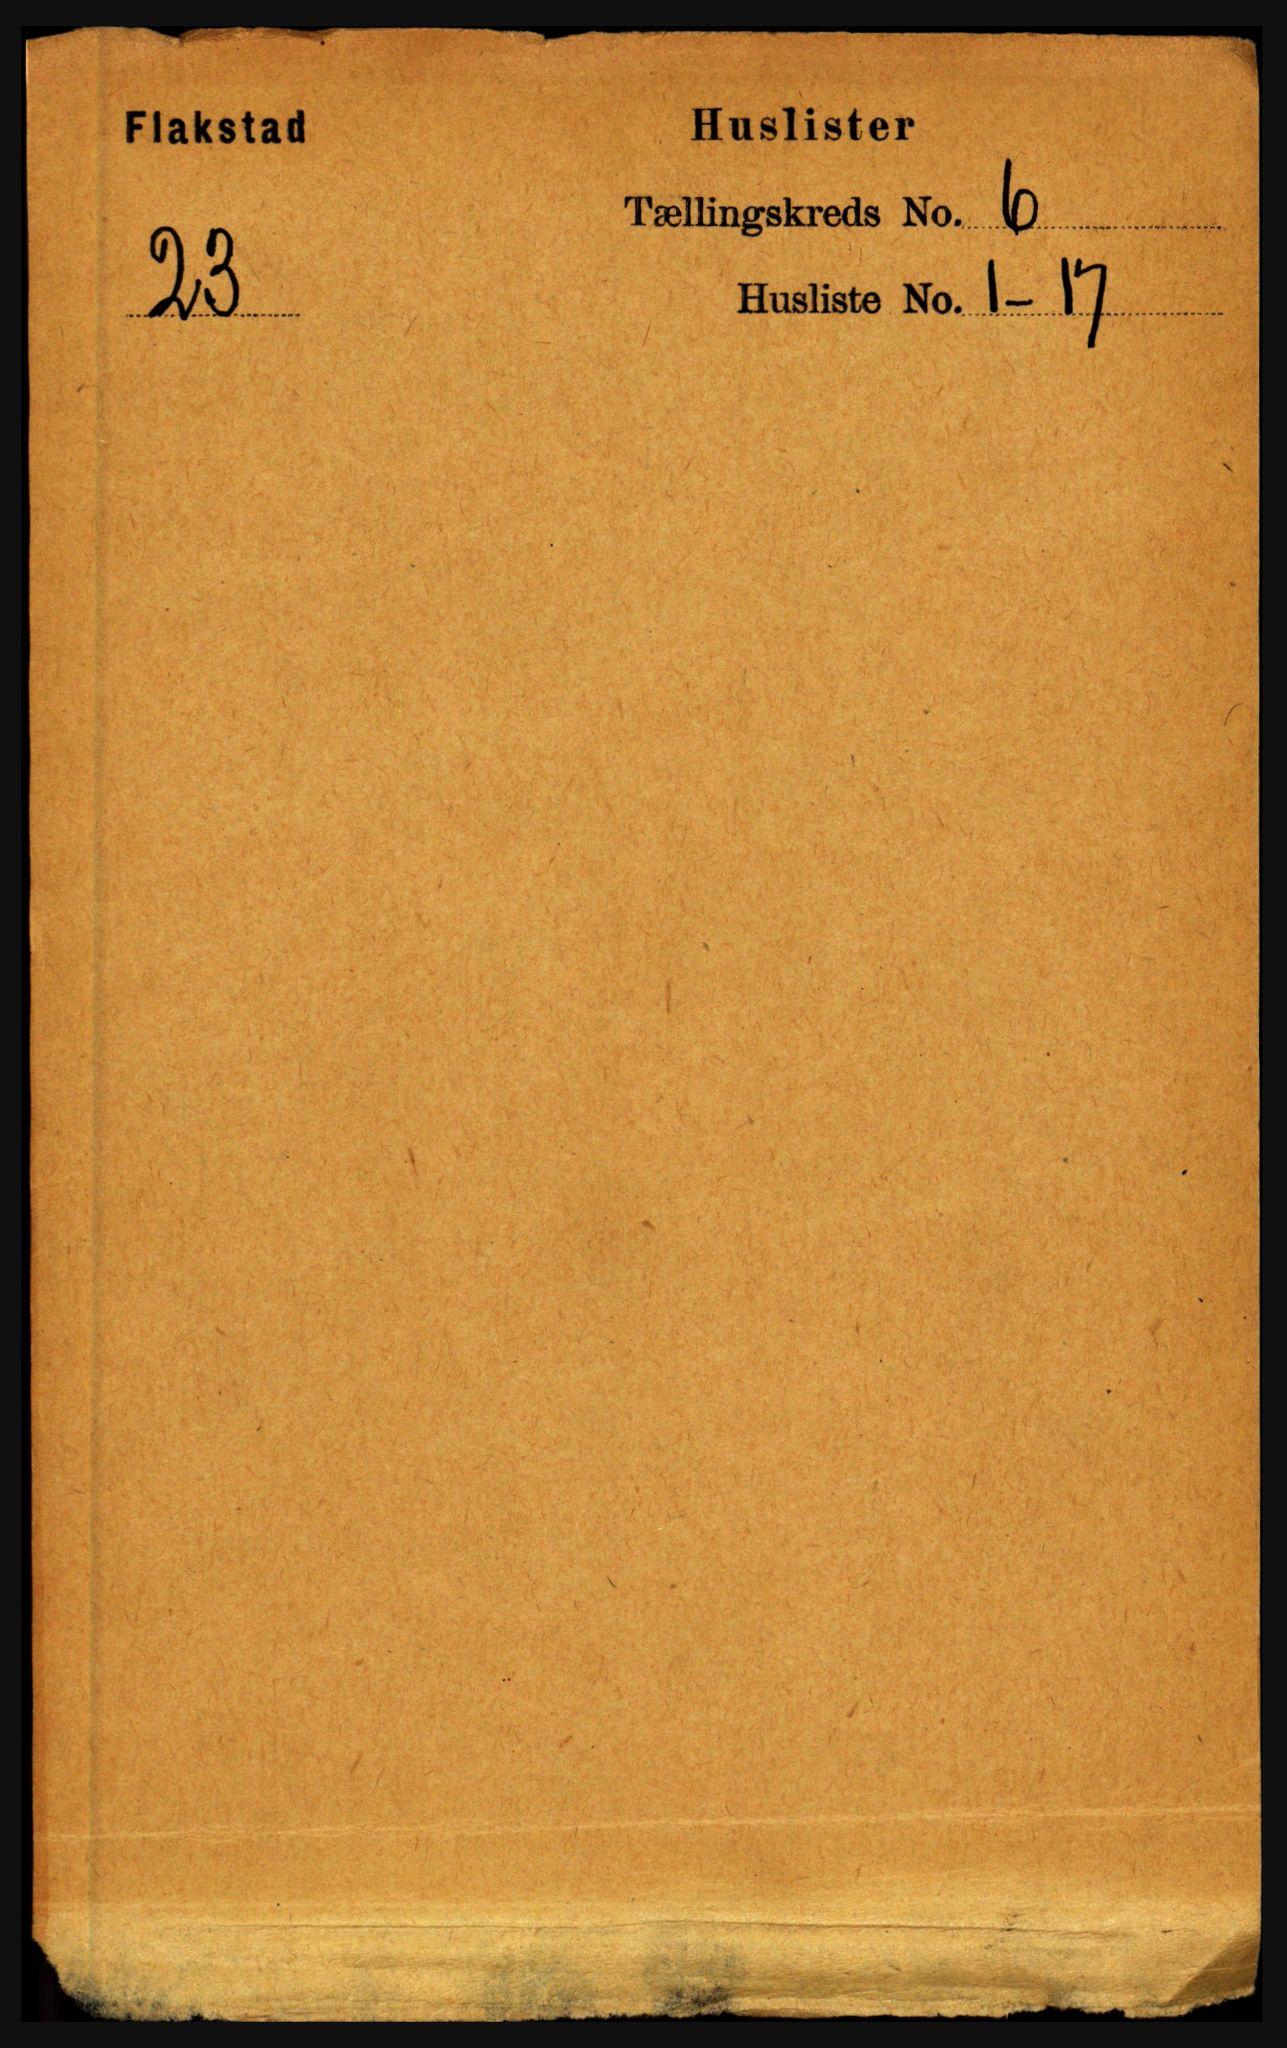 RA, Folketelling 1891 for 1859 Flakstad herred, 1891, s. 2927